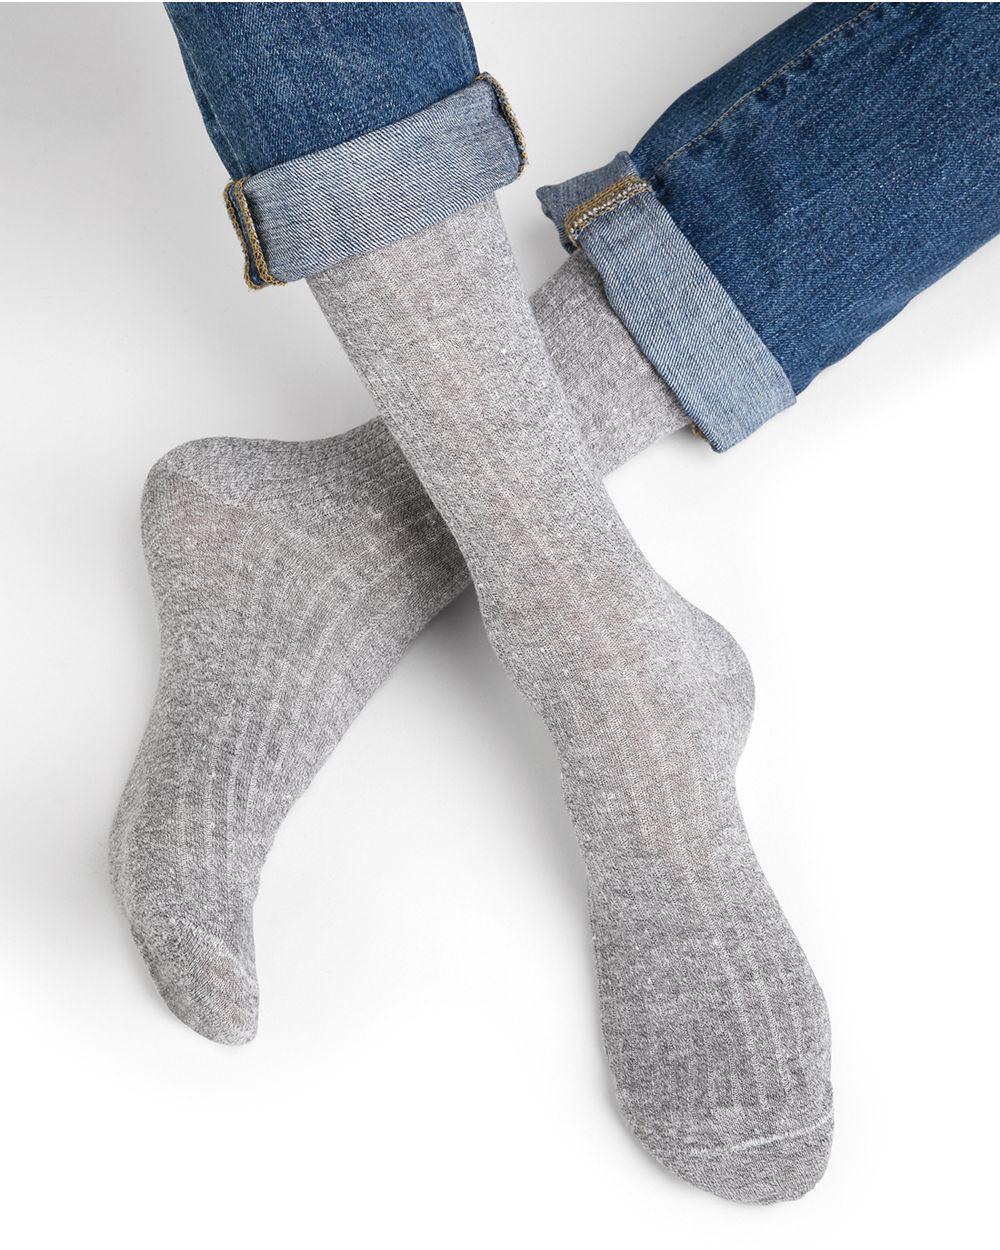 Linen and cotton socks